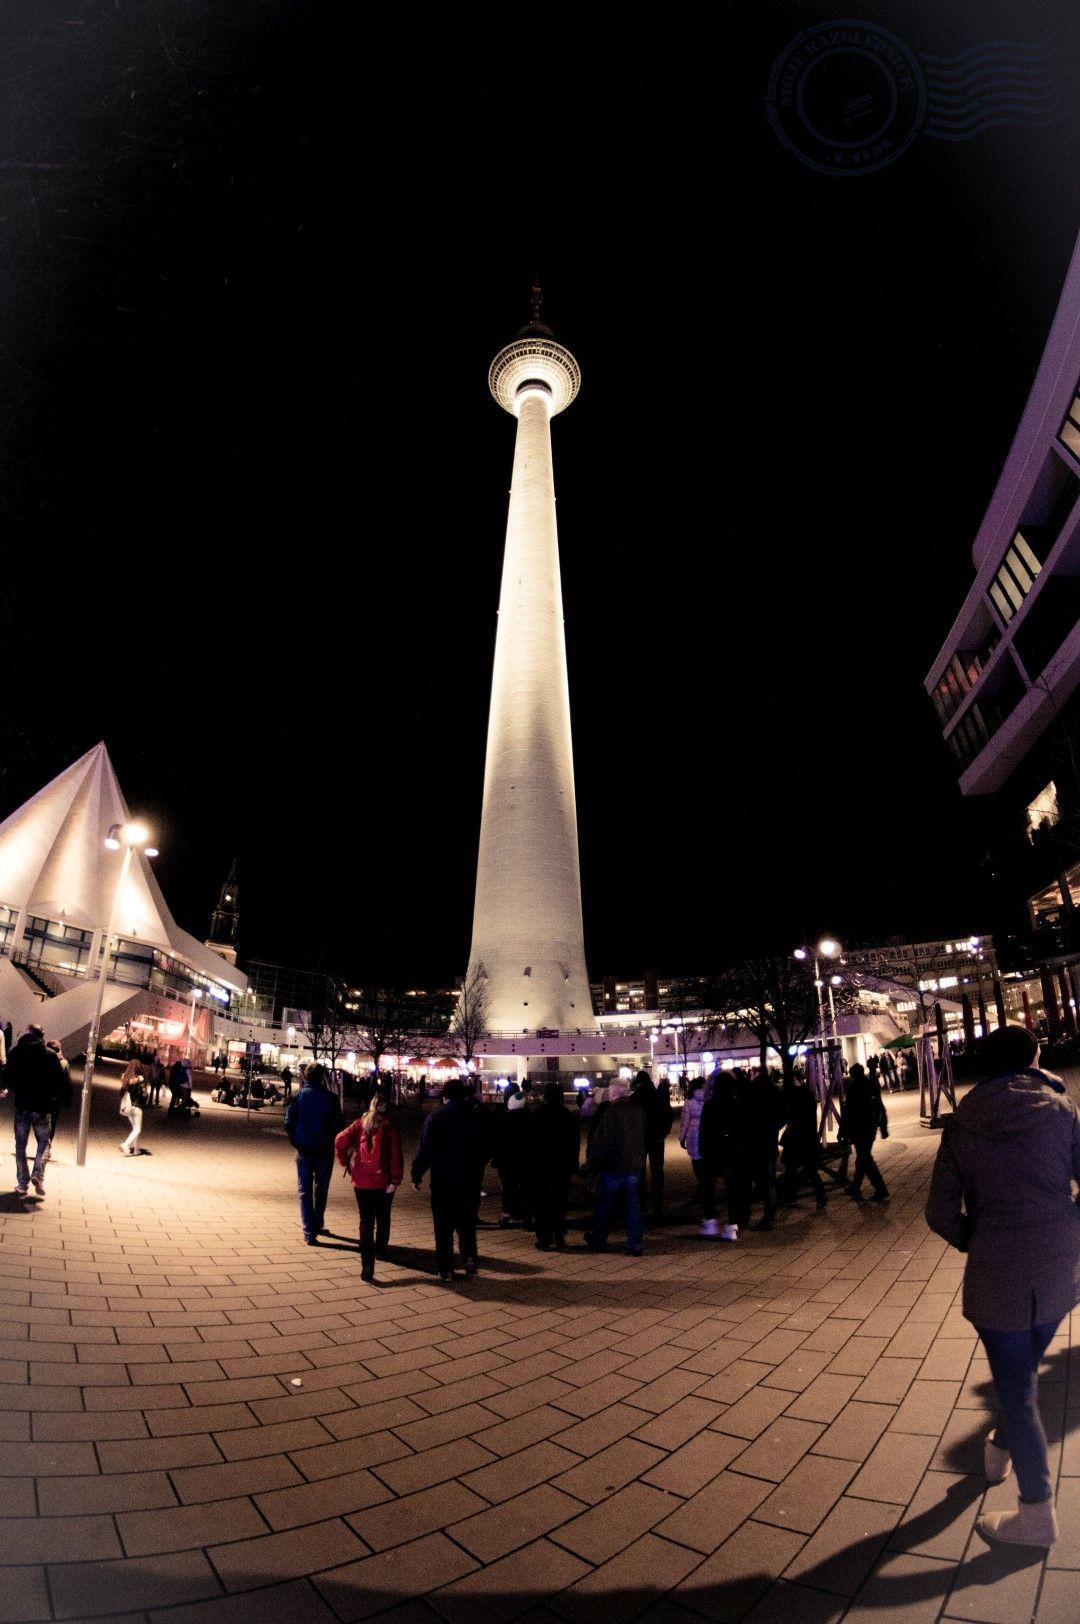 Berlin upoznavanje preko interneta